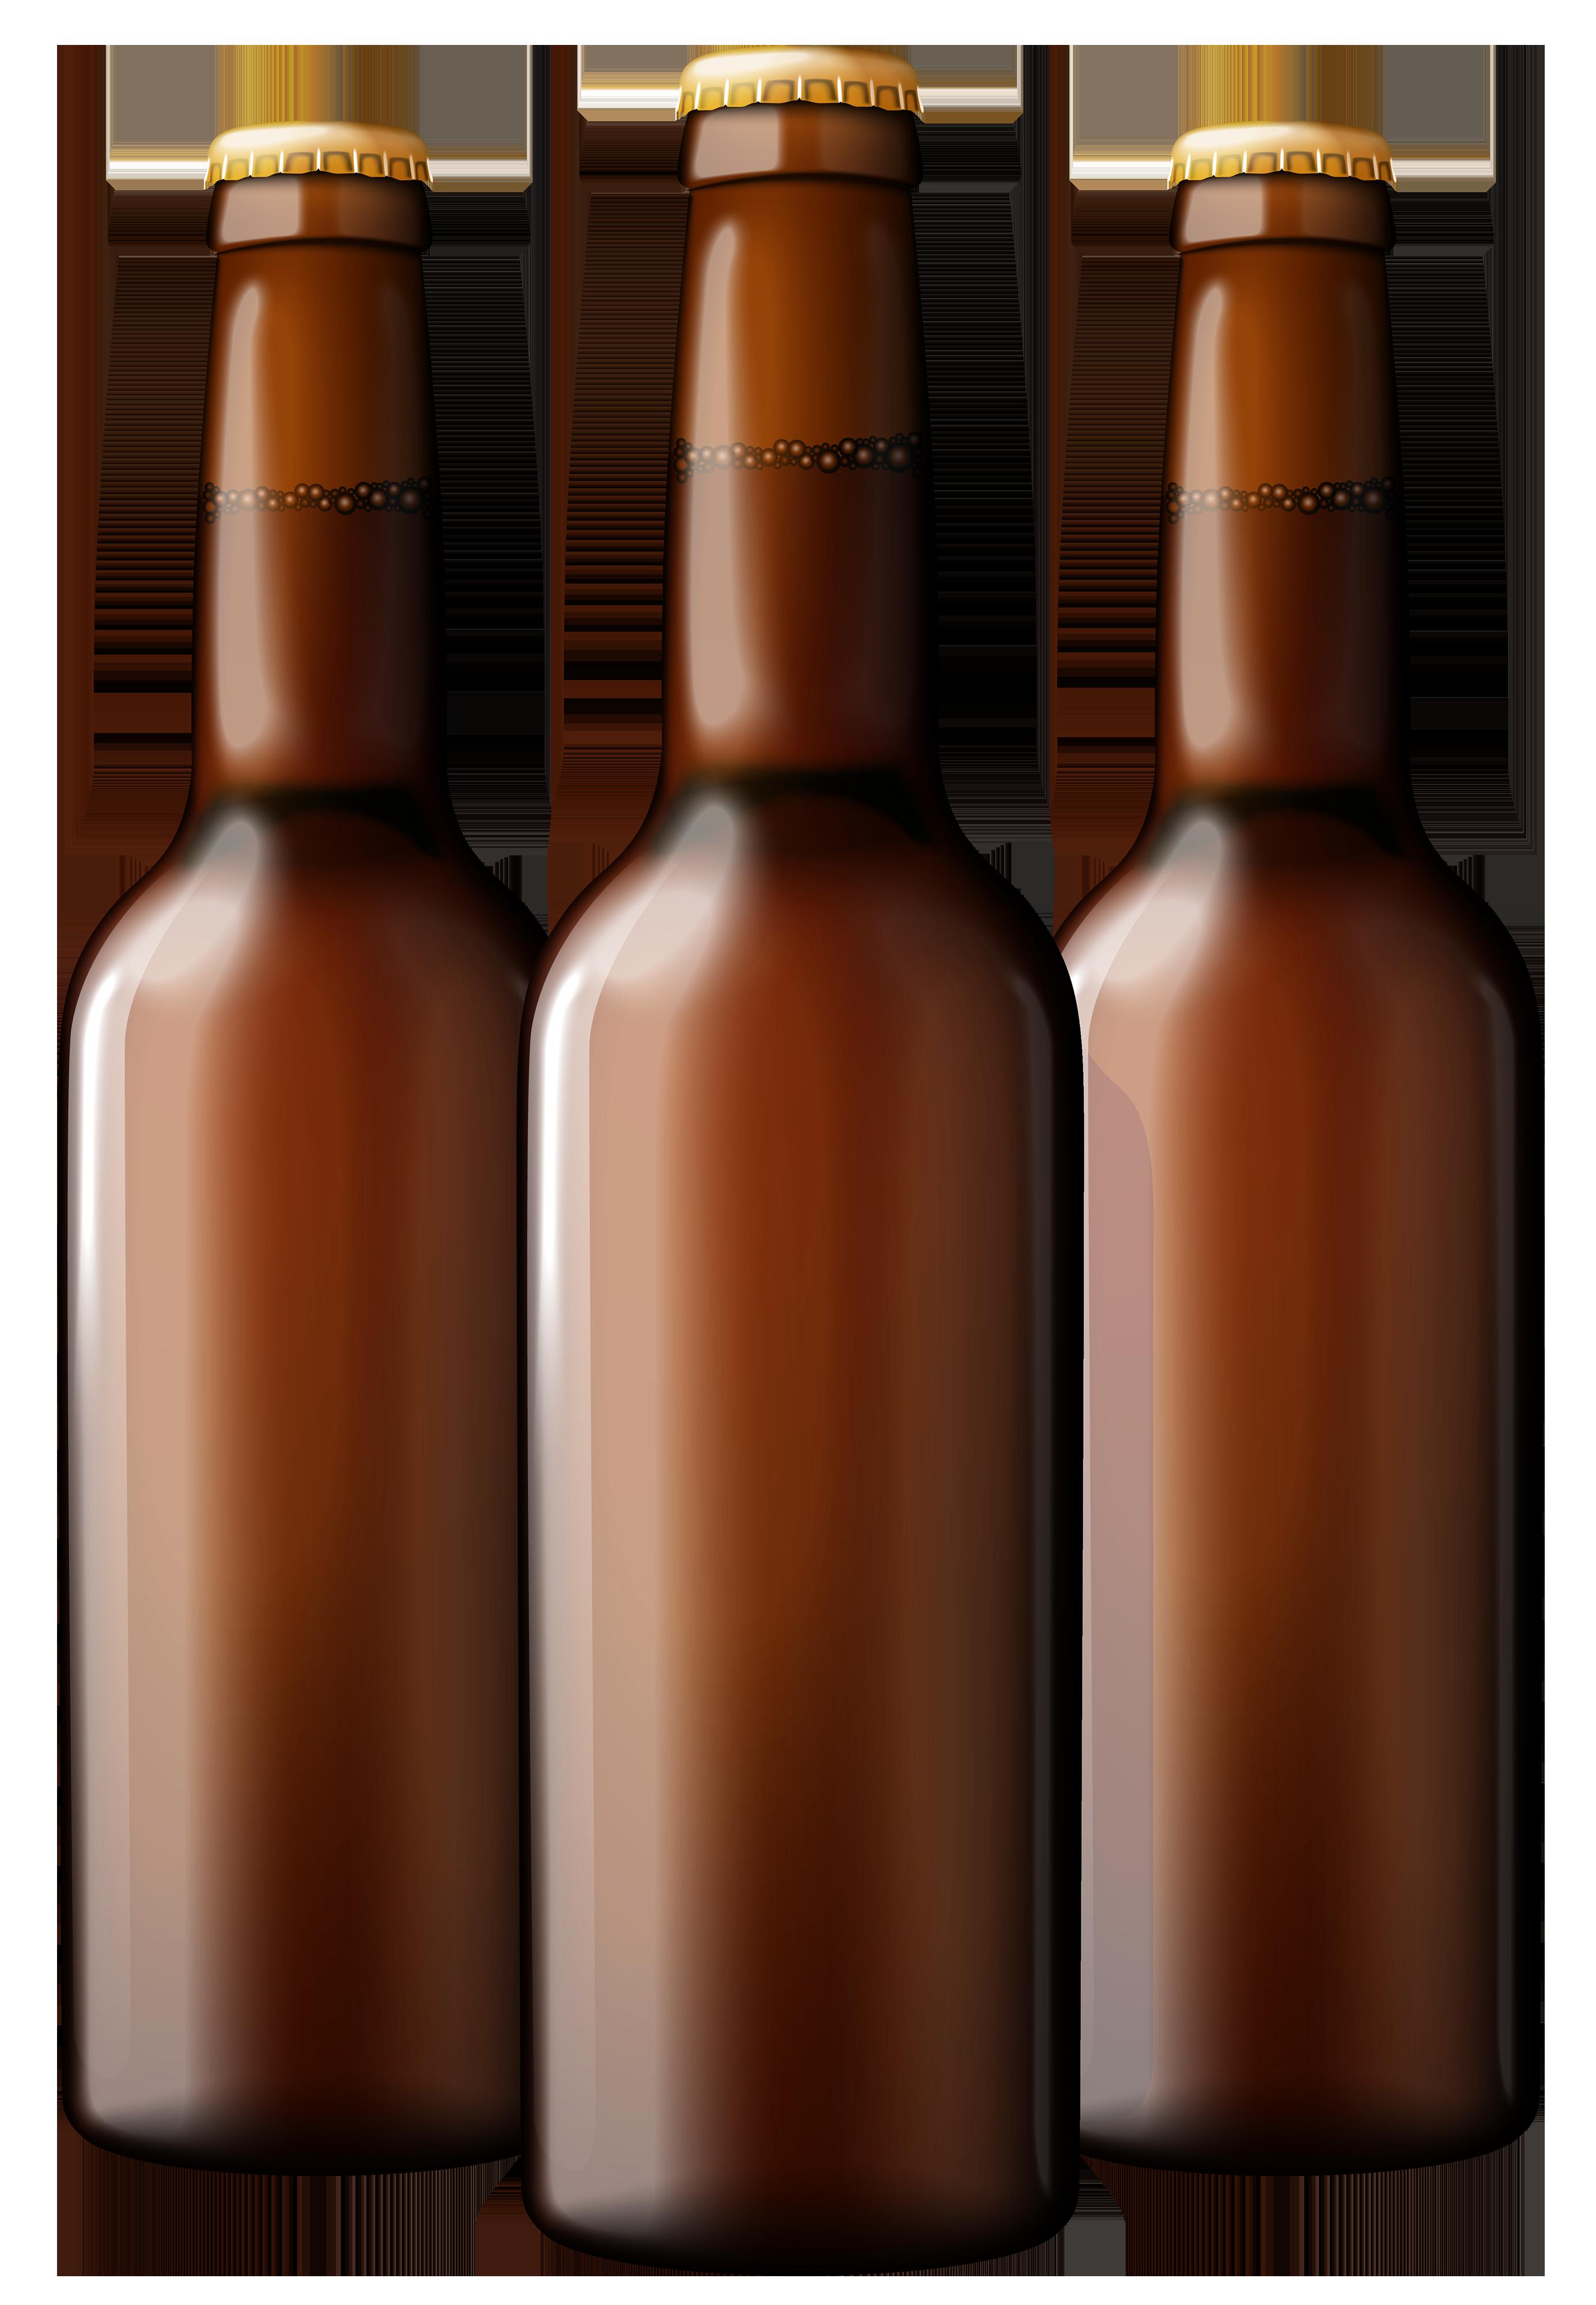 Brown Beer Bottles PNG Clipart.